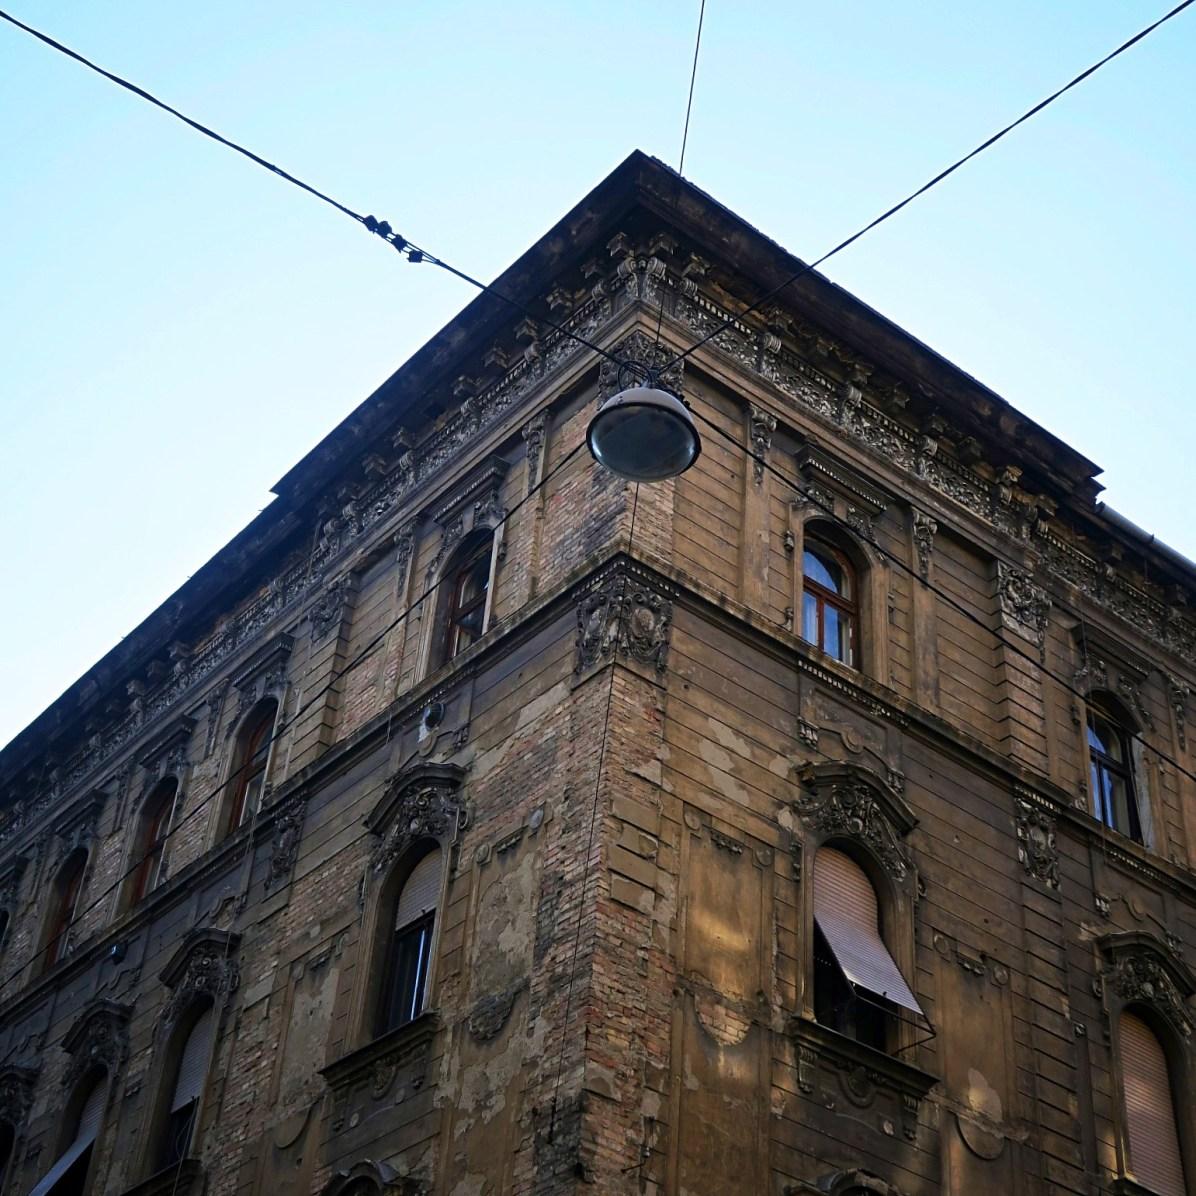 Bild: Axel Wolf, 09.08.2018, Budapest